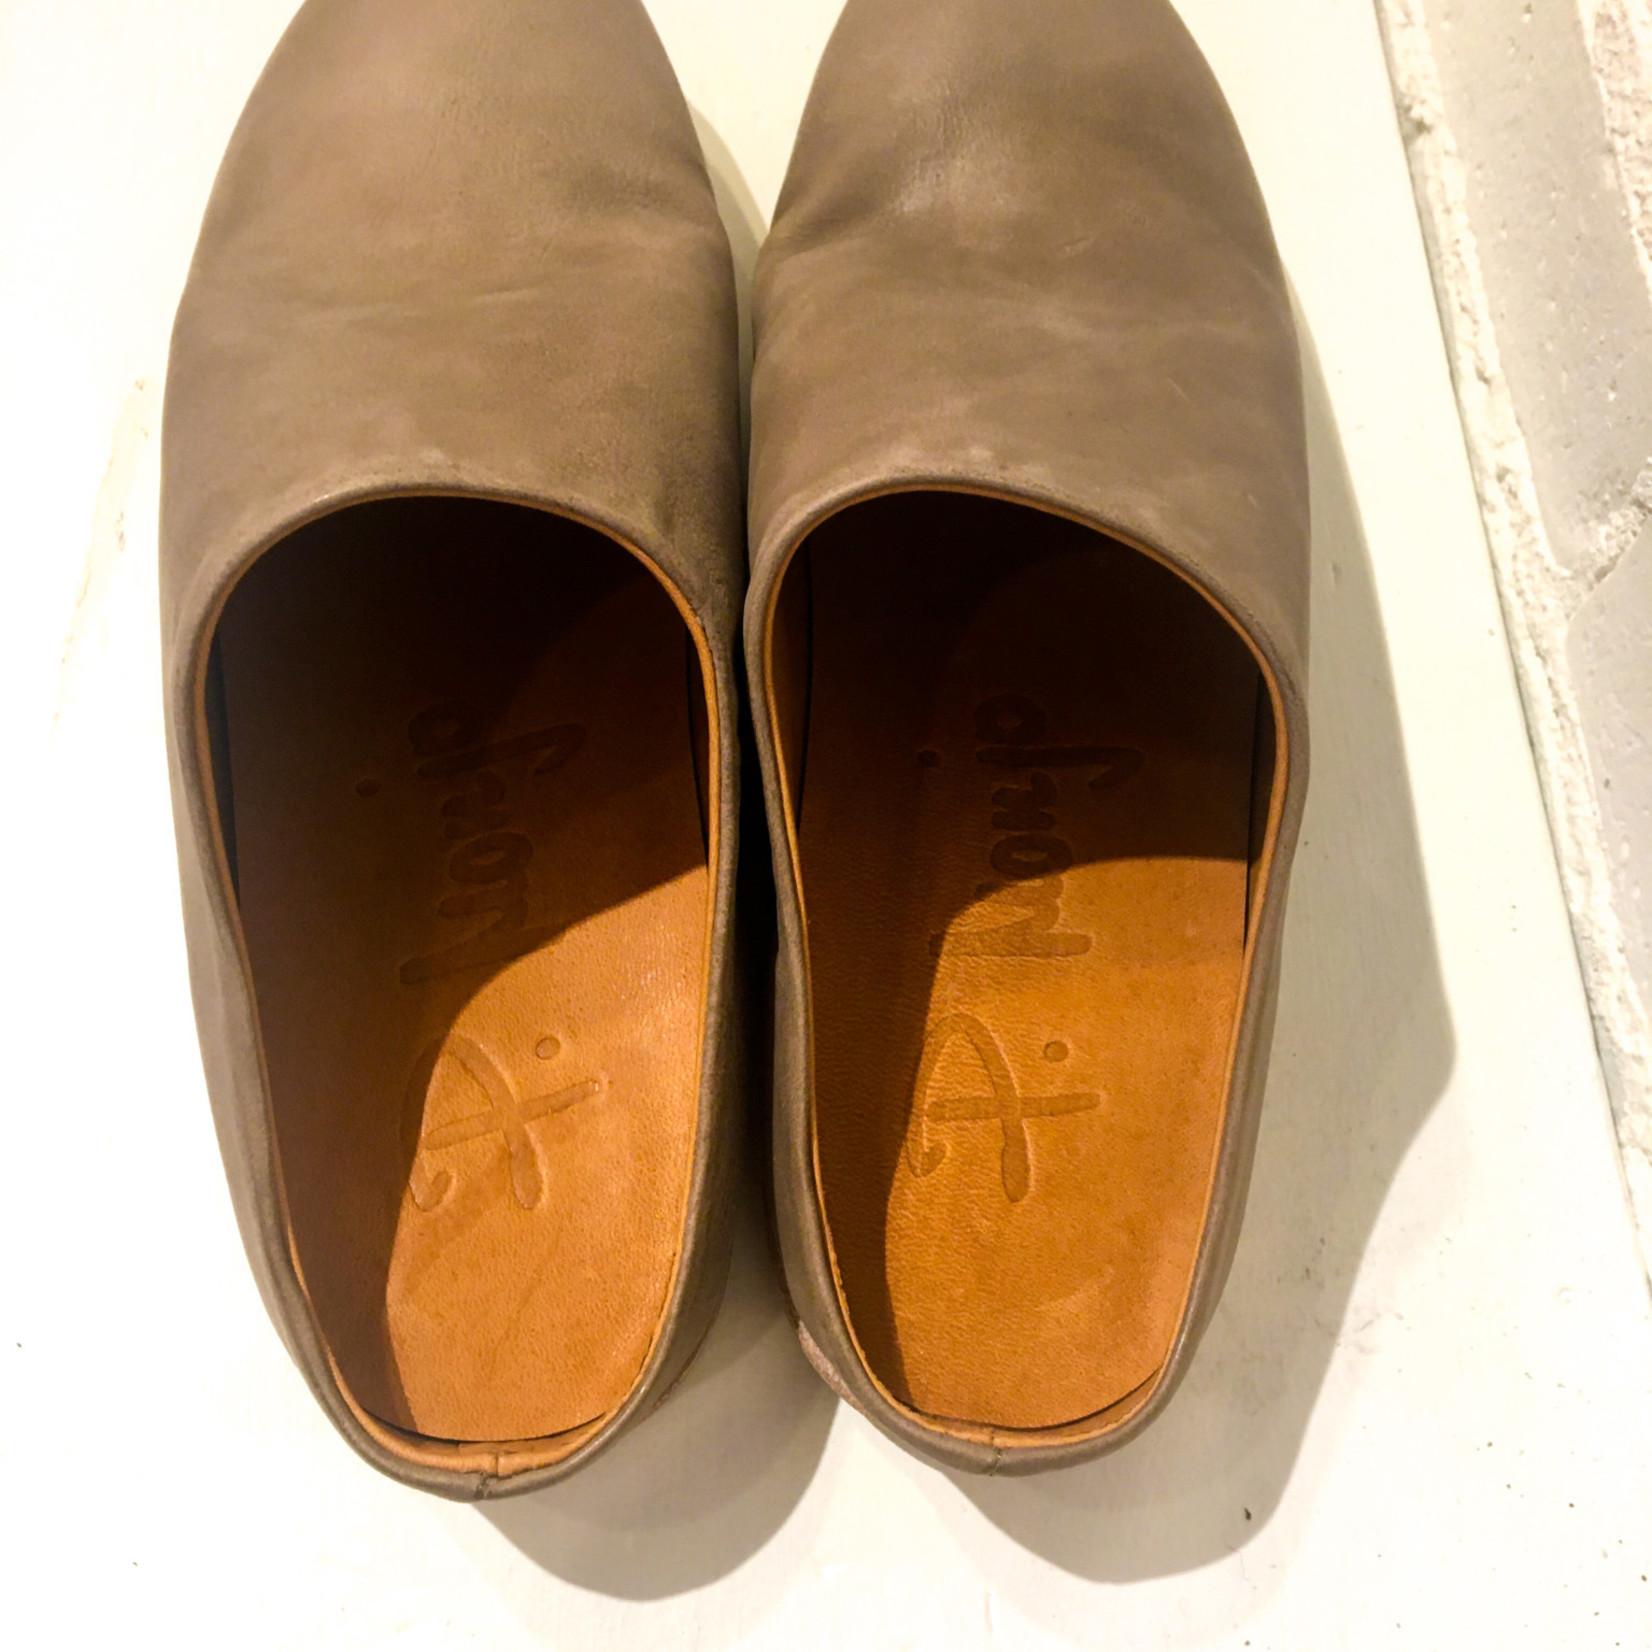 P. Monjo Todi Piedra Slip On Shoes